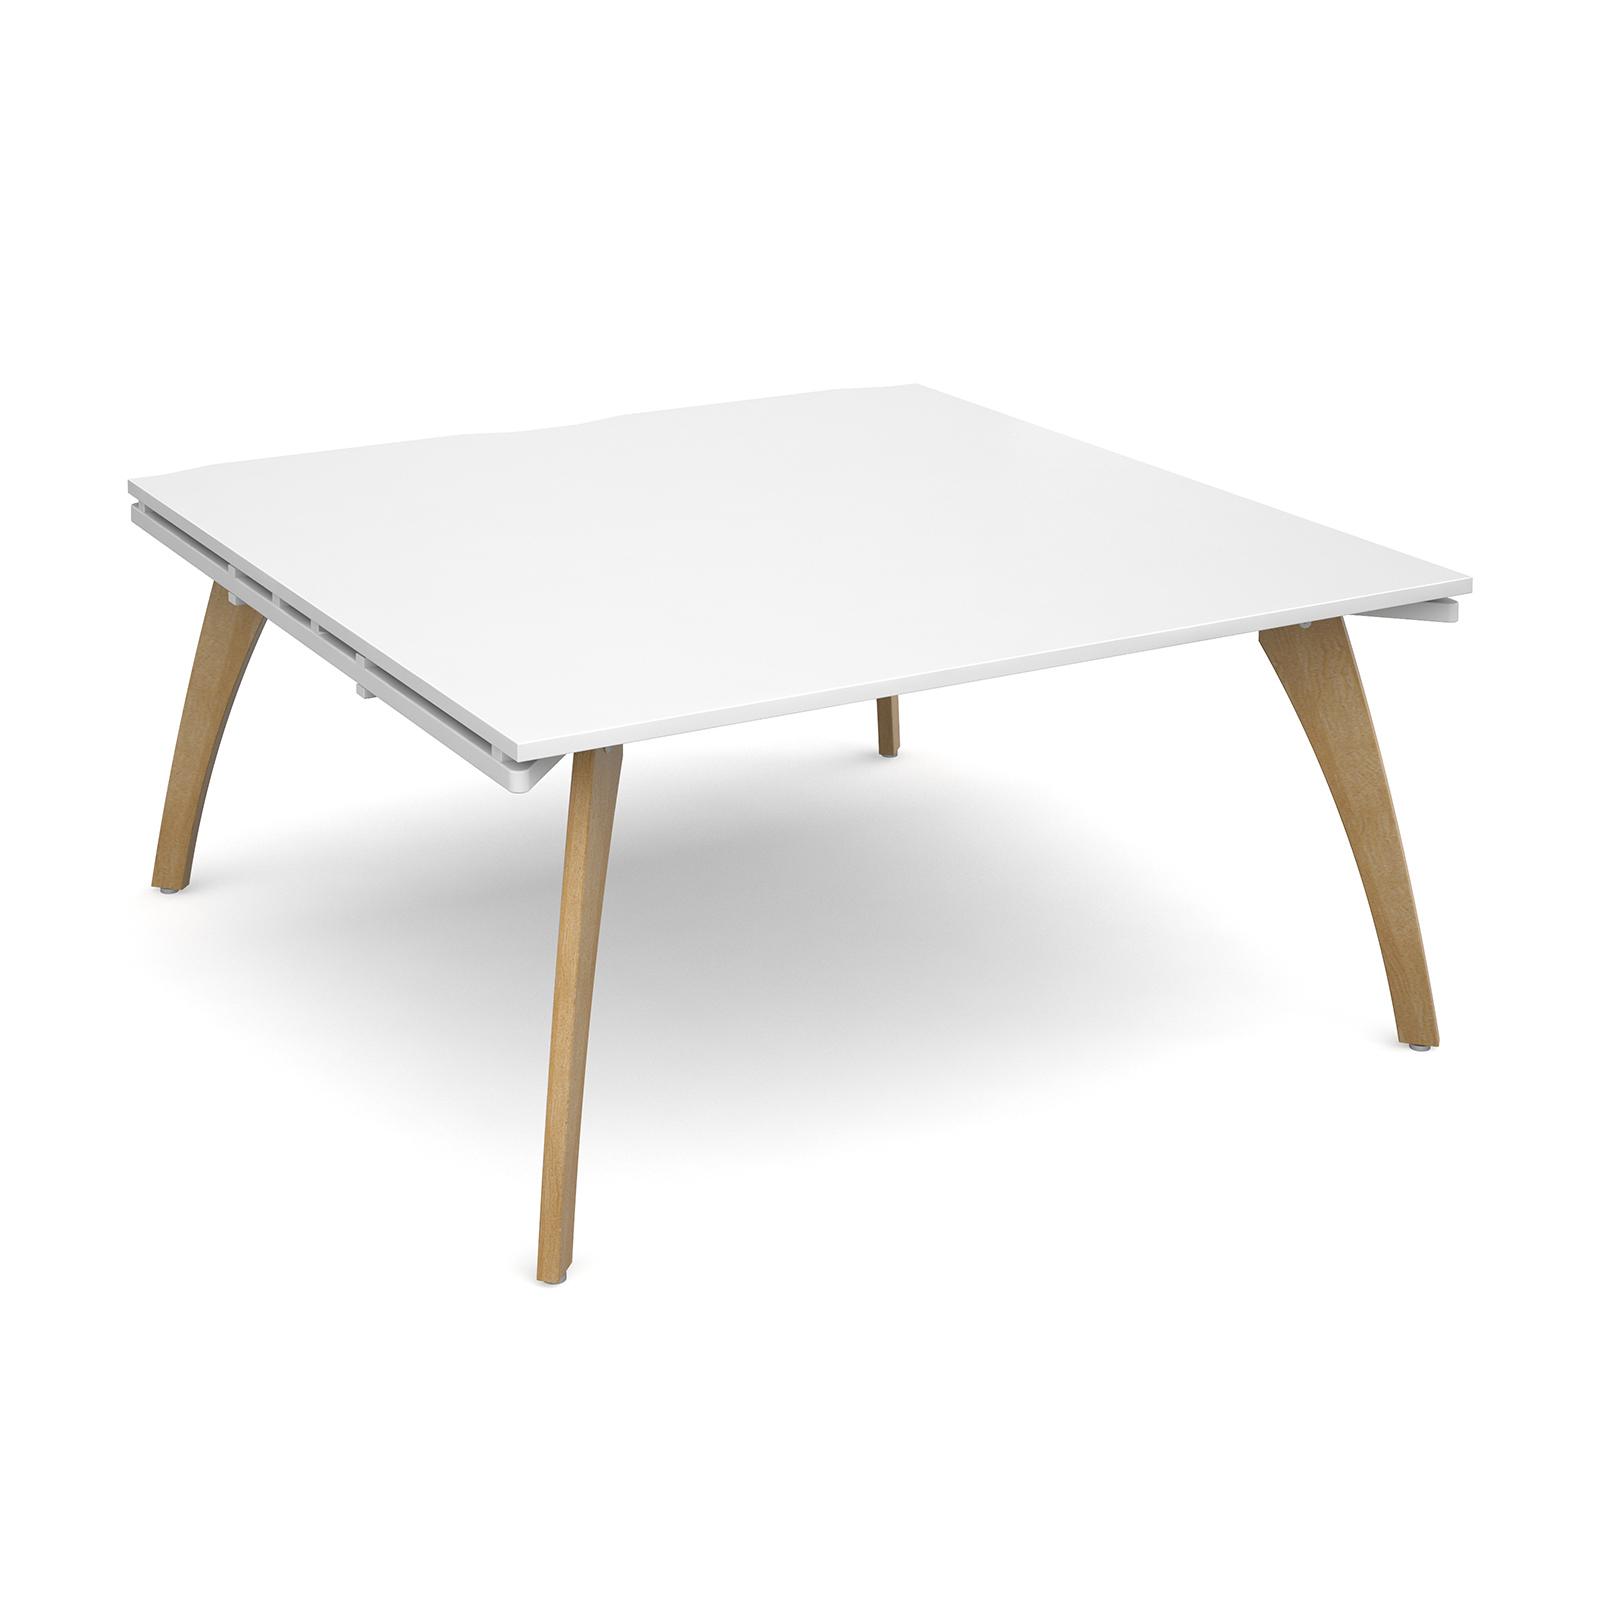 Fuze boardroom table starter unit 1600mm x 1600mm - white frame, white top